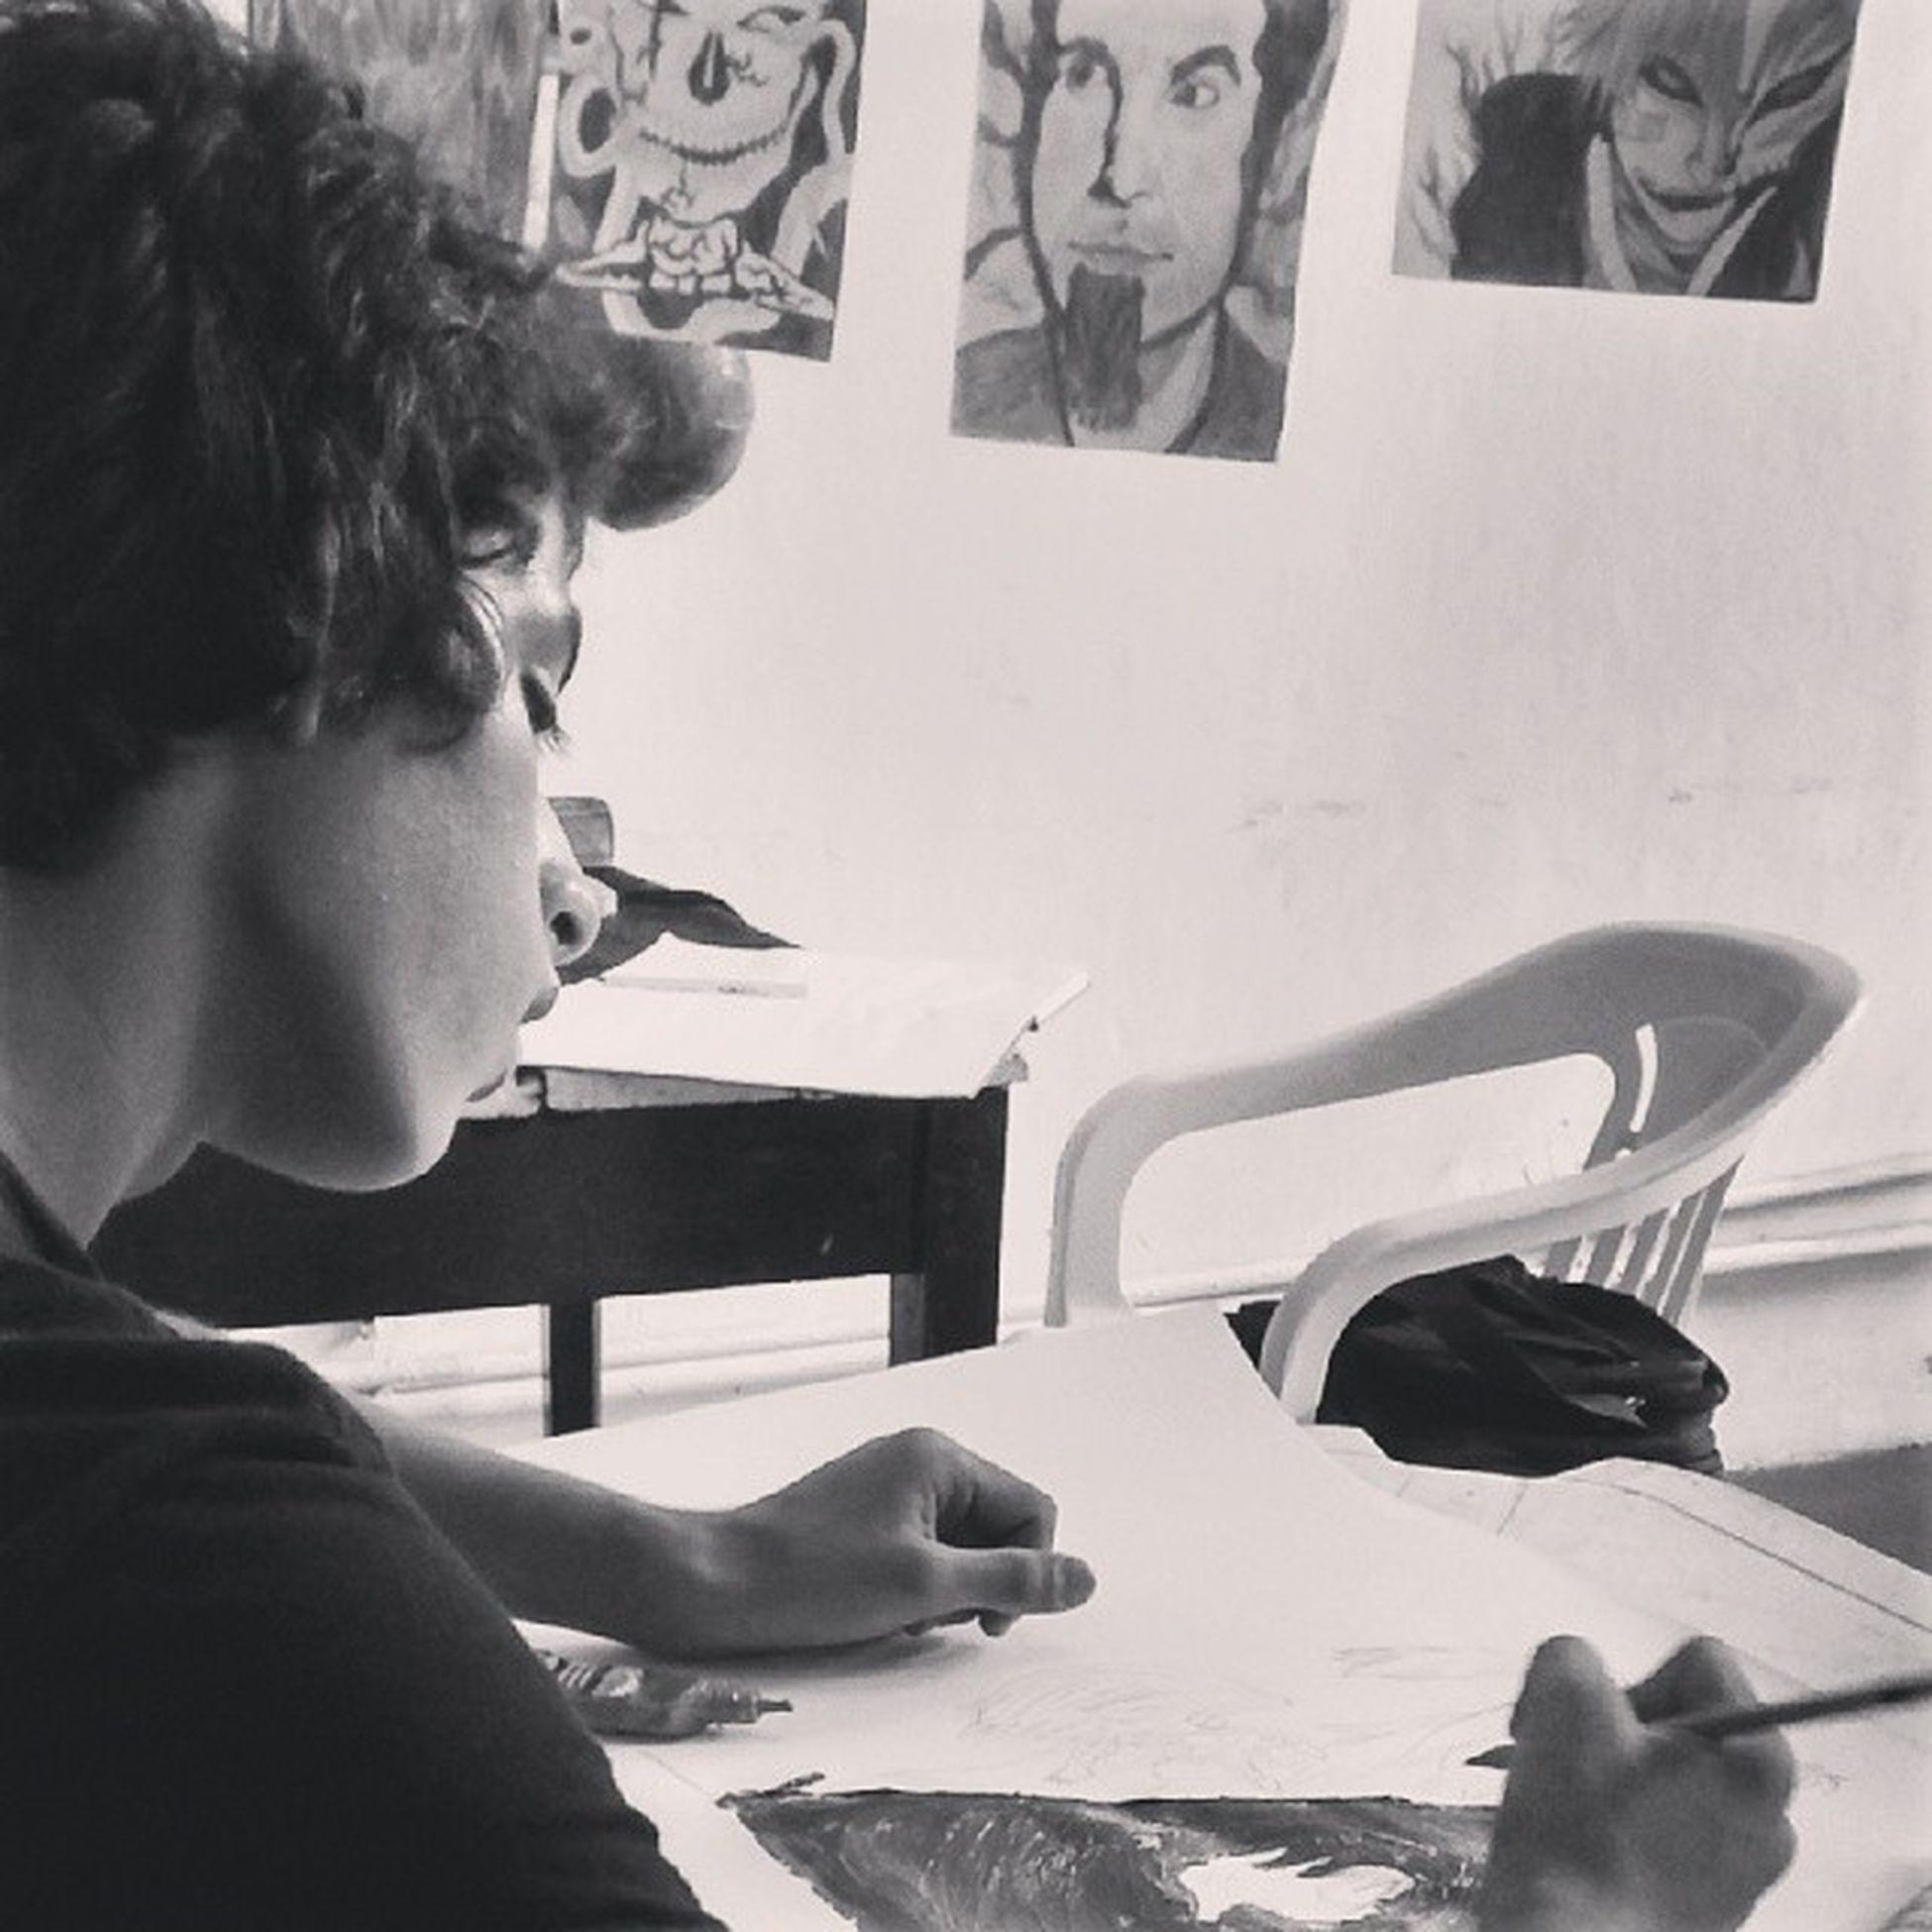 Igor Beausoleil pintando no Espacomacunaima Portoseguro Brazil Bahia art kunst draw sketch painting acrylic go thanks